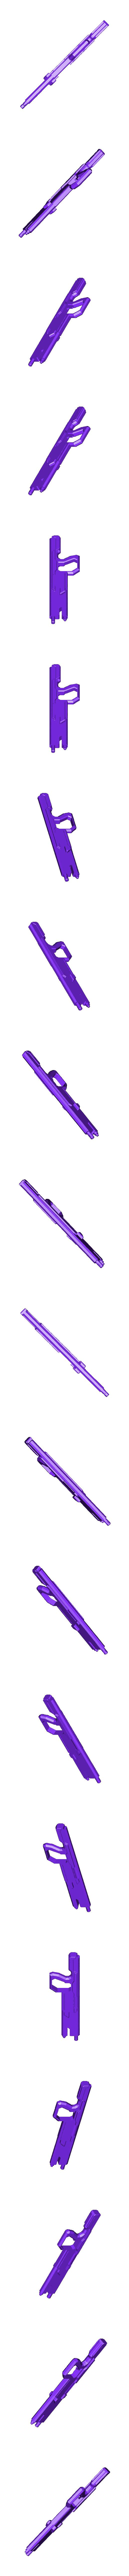 Heavy Gun_01_Silver.stl Download STL file Heavy Gun Walker • 3D print design, Jwoong